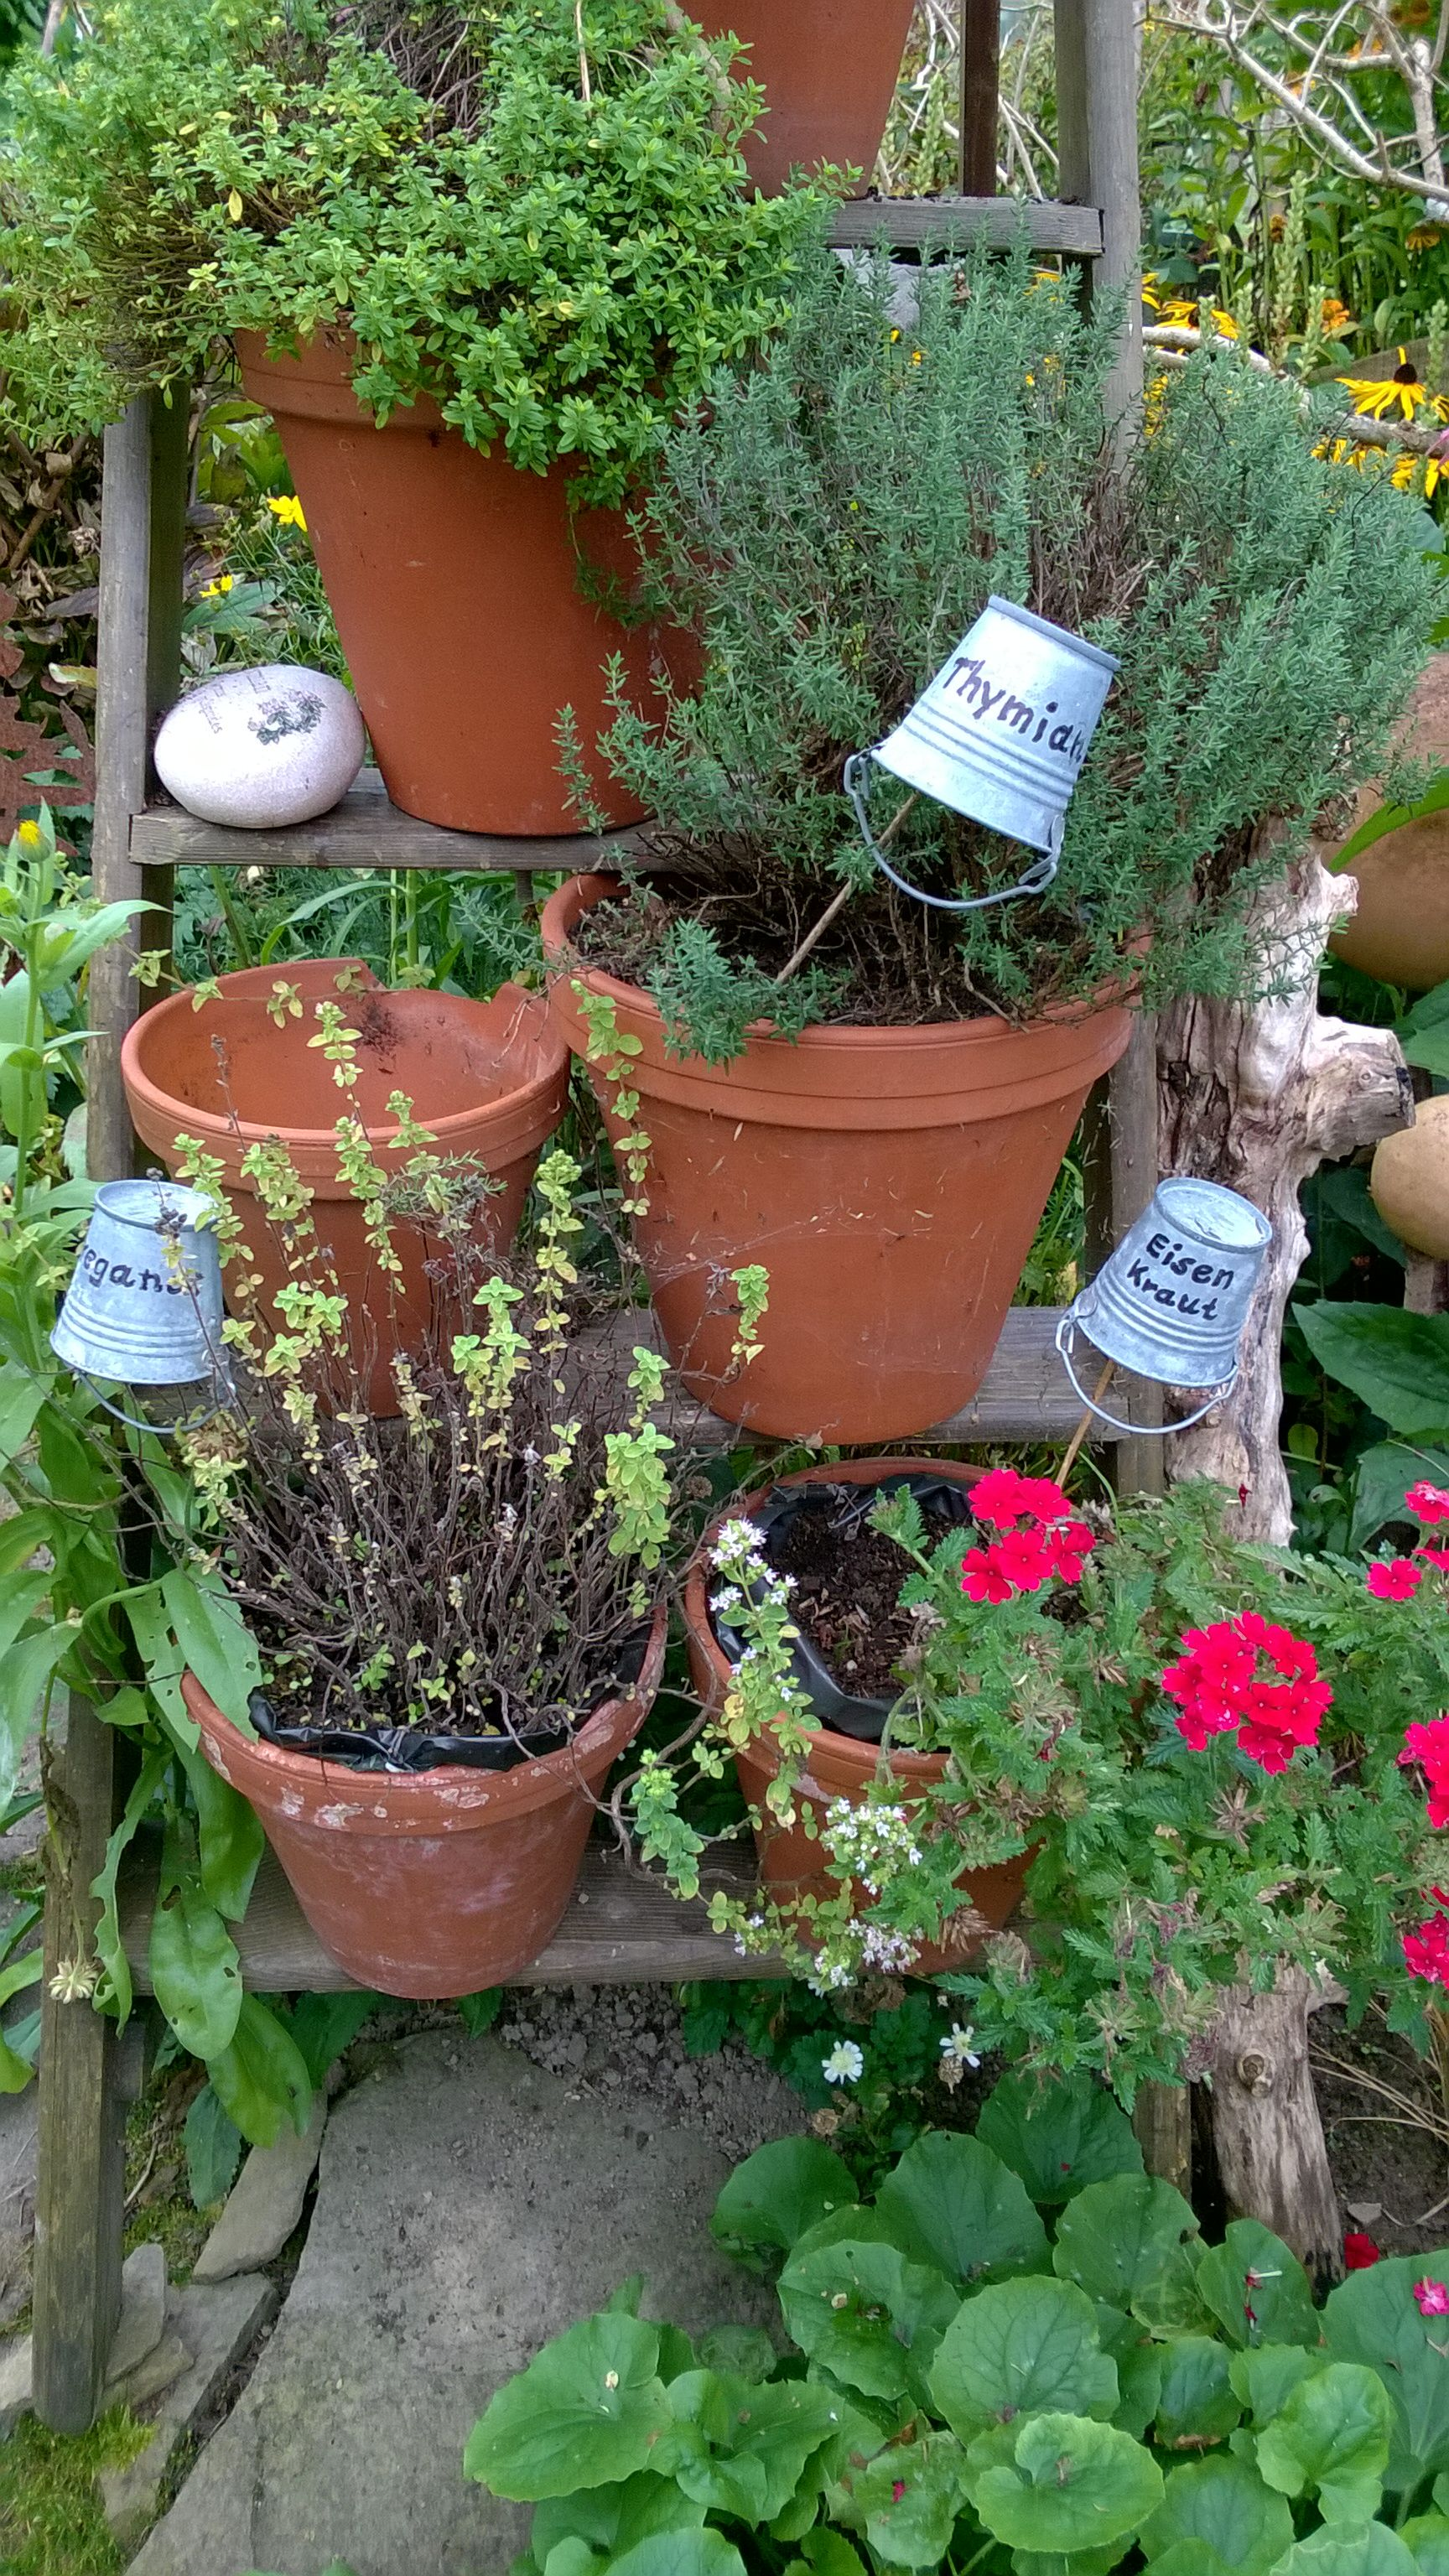 Garten T Raume Garten T Raume Gartendeko Garteninspiration